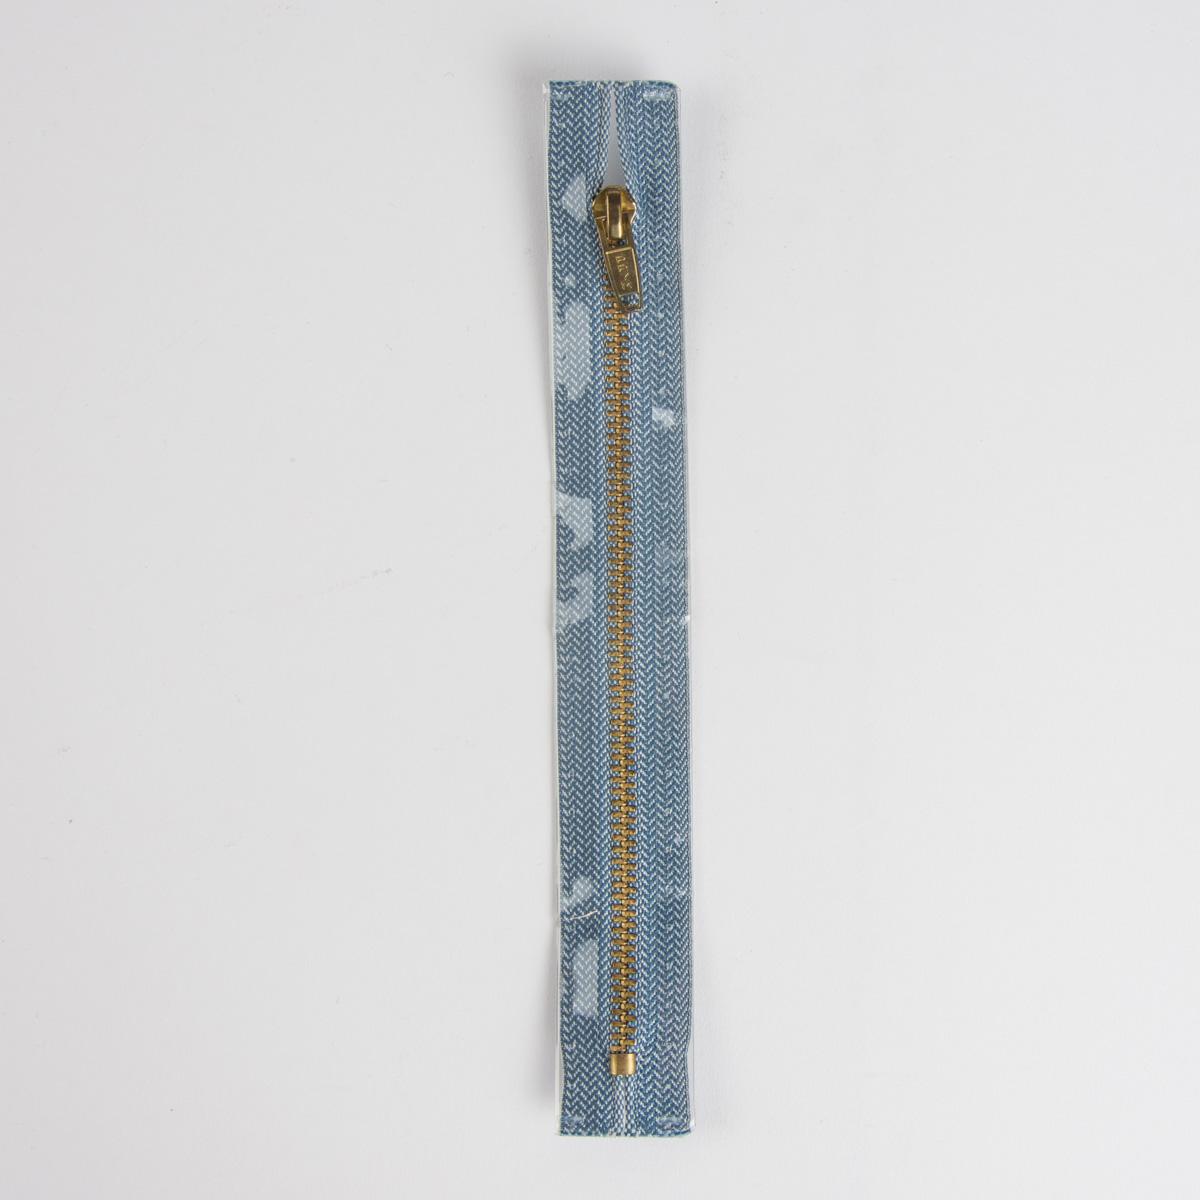 Reißverschluss M8 Typ 5 SSP 6cm go-fb Fla jeansblau